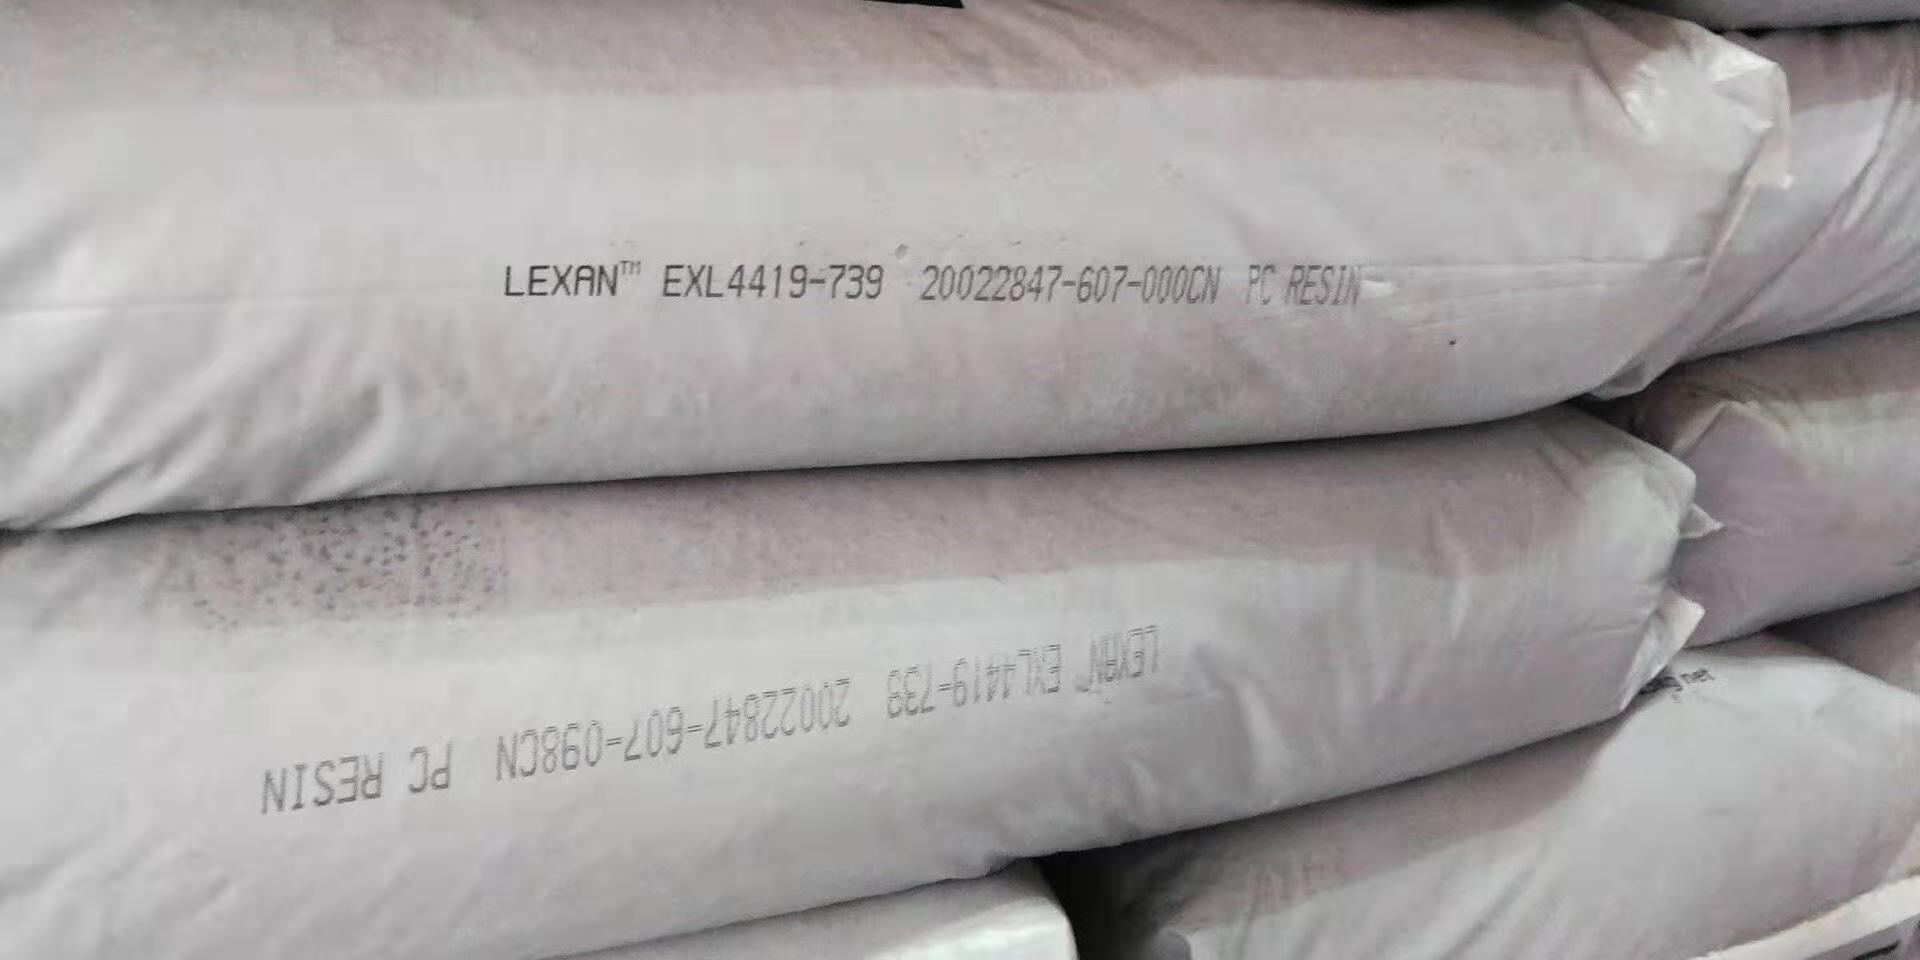 9% glass fiber reinforced amorphous polycarbonate-siloxane copolymer